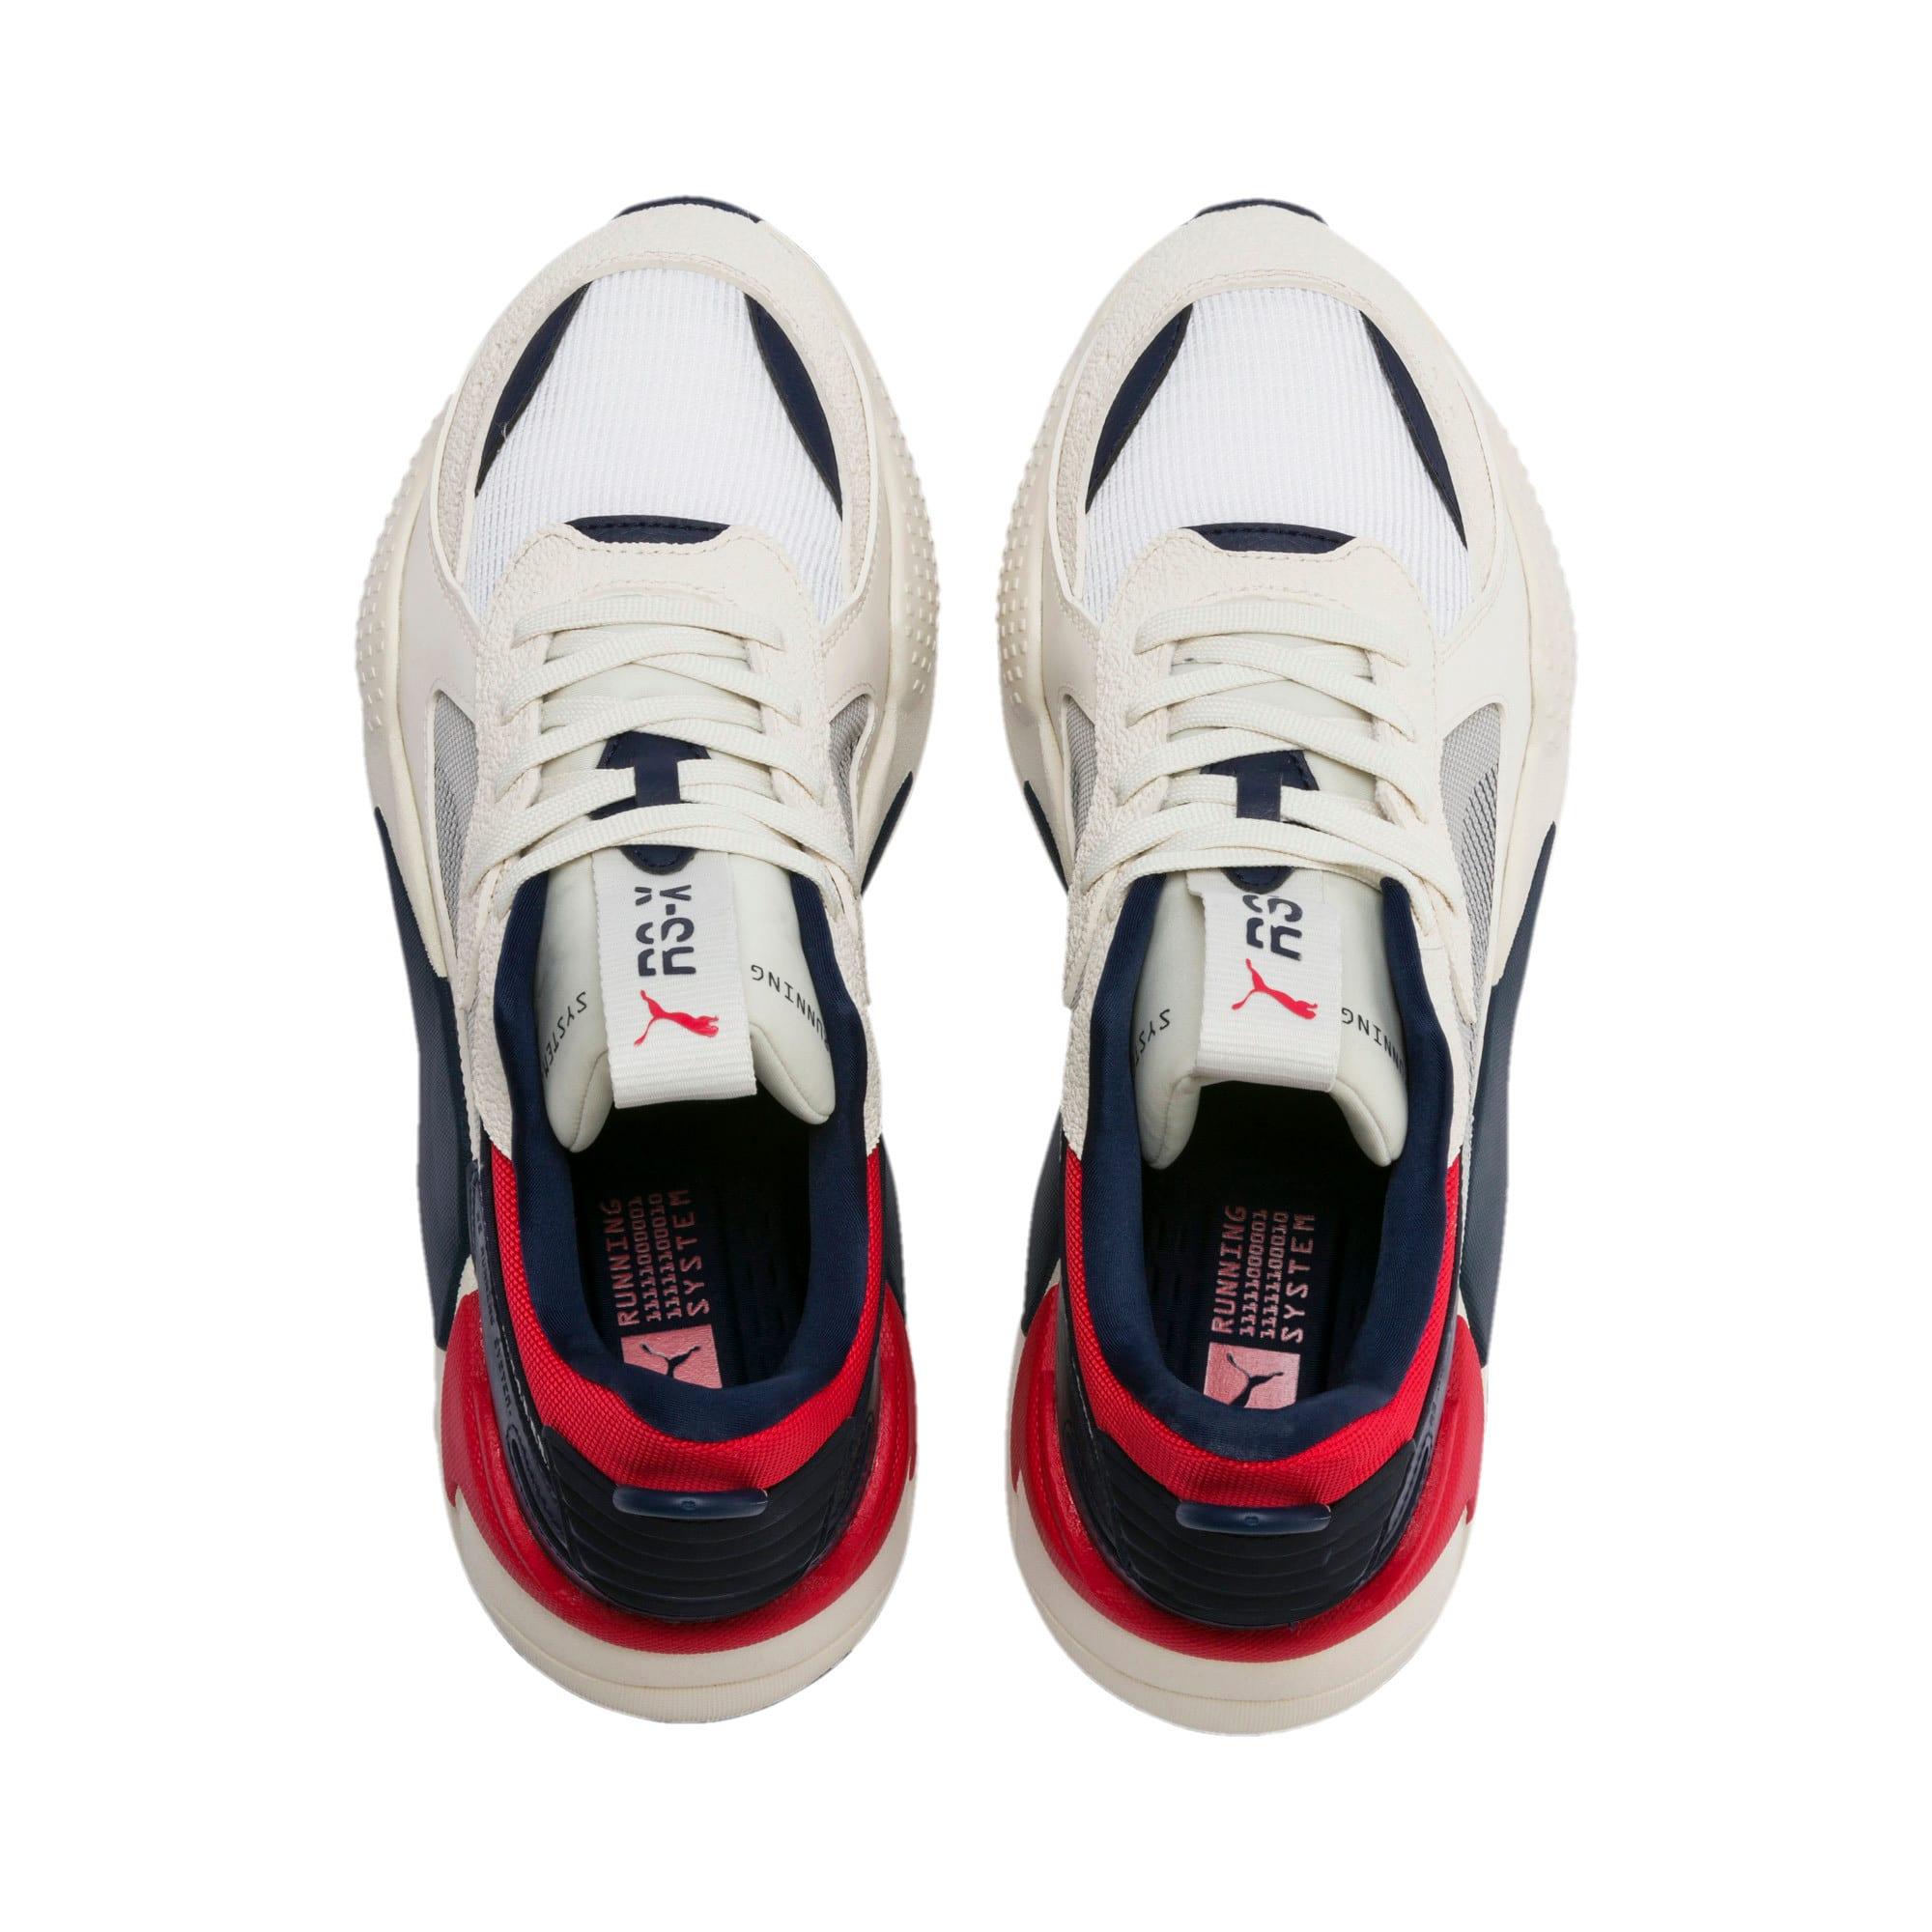 Thumbnail 7 of RS-X Hard Drive Sneakers, Whisper White-Peacoat, medium